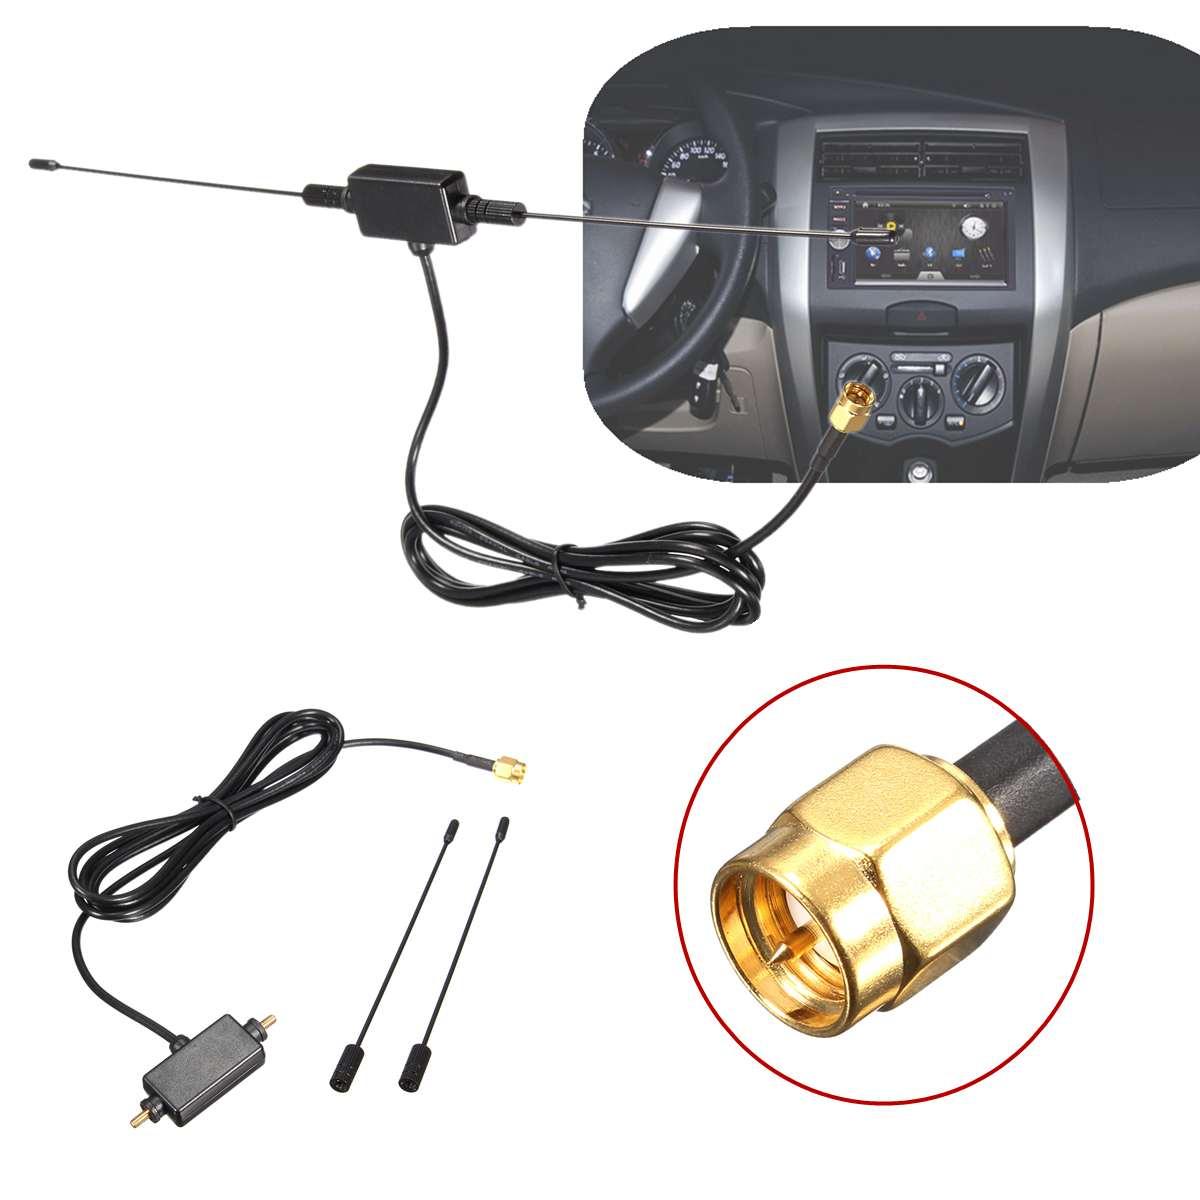 Universal Car Digital TV Antenna 5ft In Car Radio Digital DVB-T ISDB-T TV Signal 6dBi Antenna 433 MHZ Amplifier 9 -